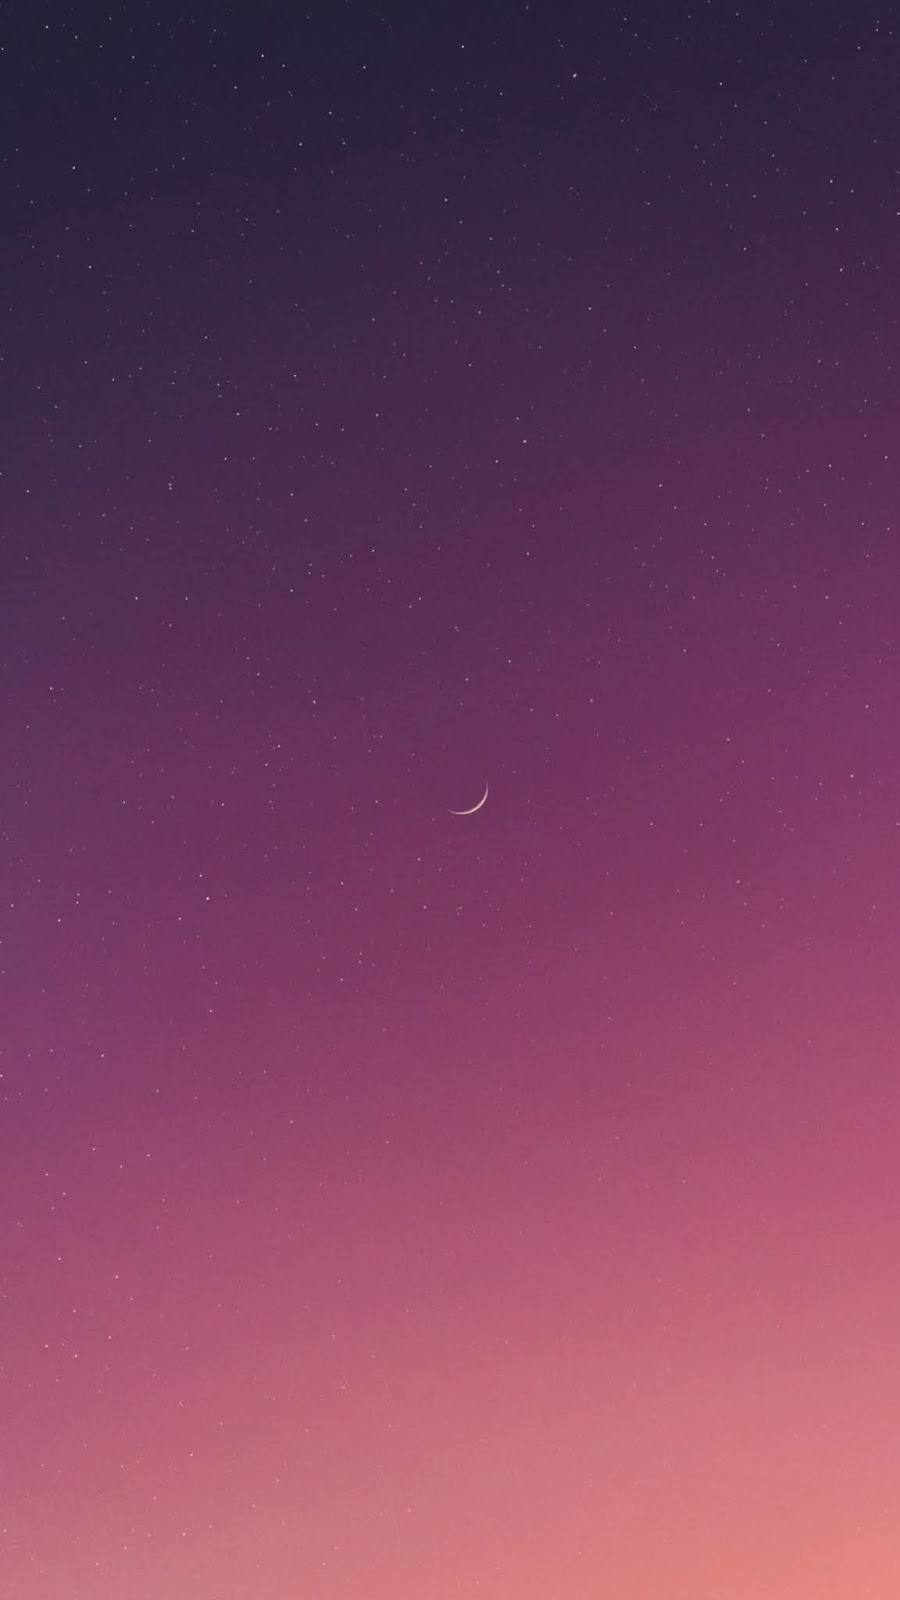 Enchanted night sky